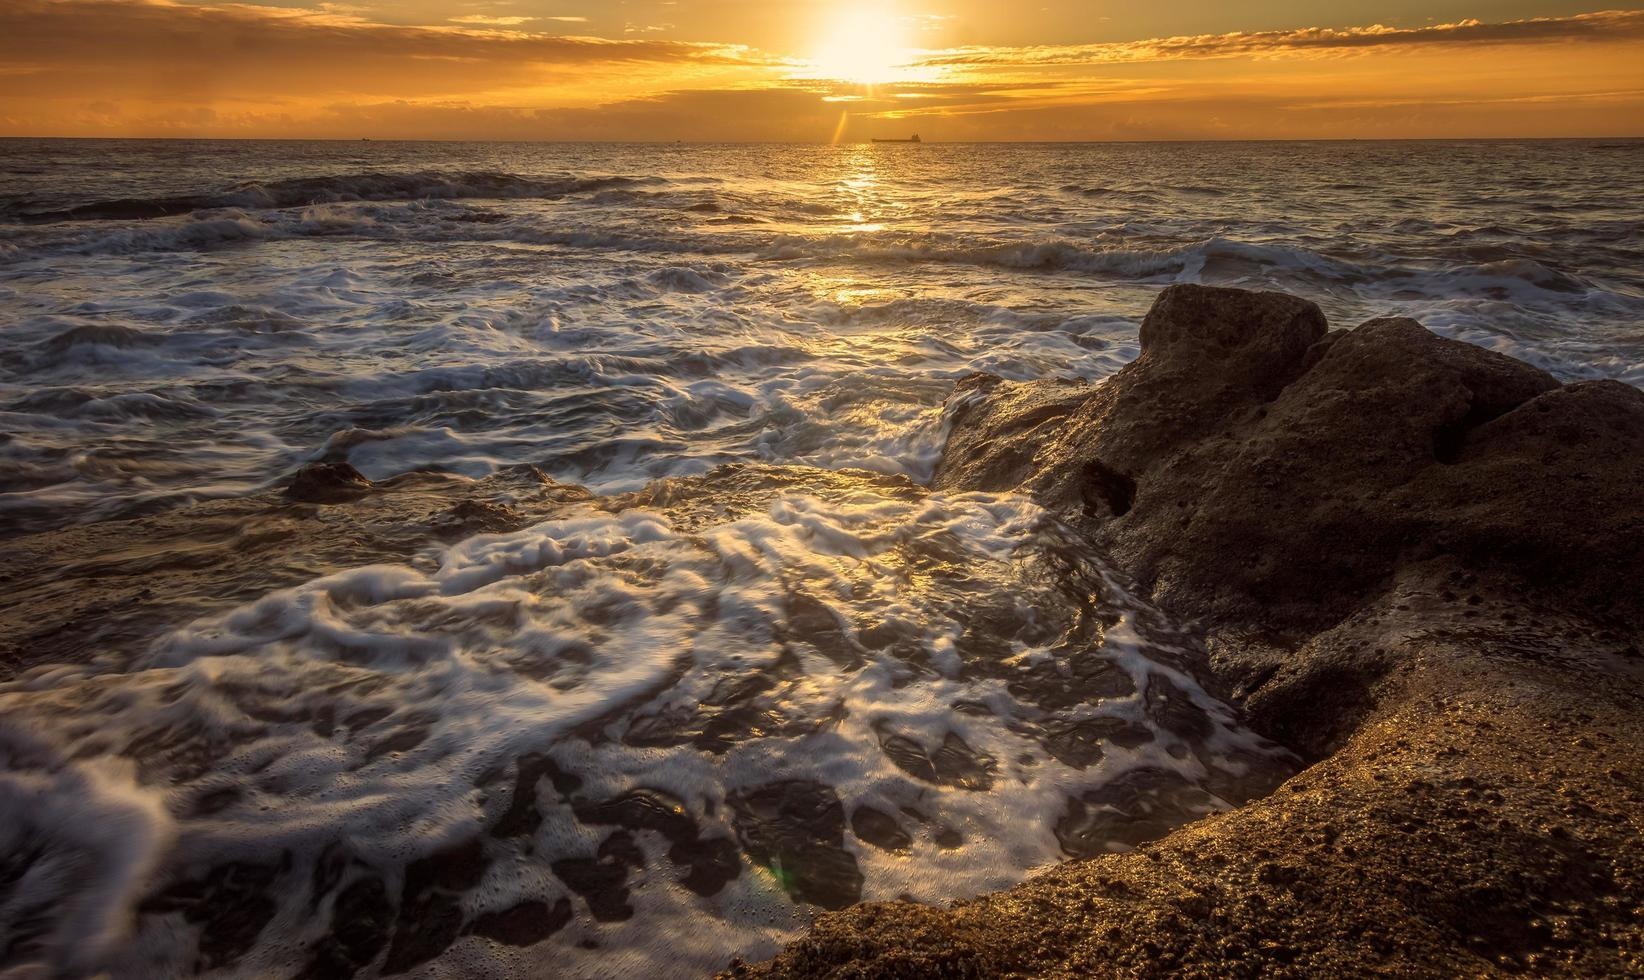 havsvågor kraschar på stranden under solnedgången foto